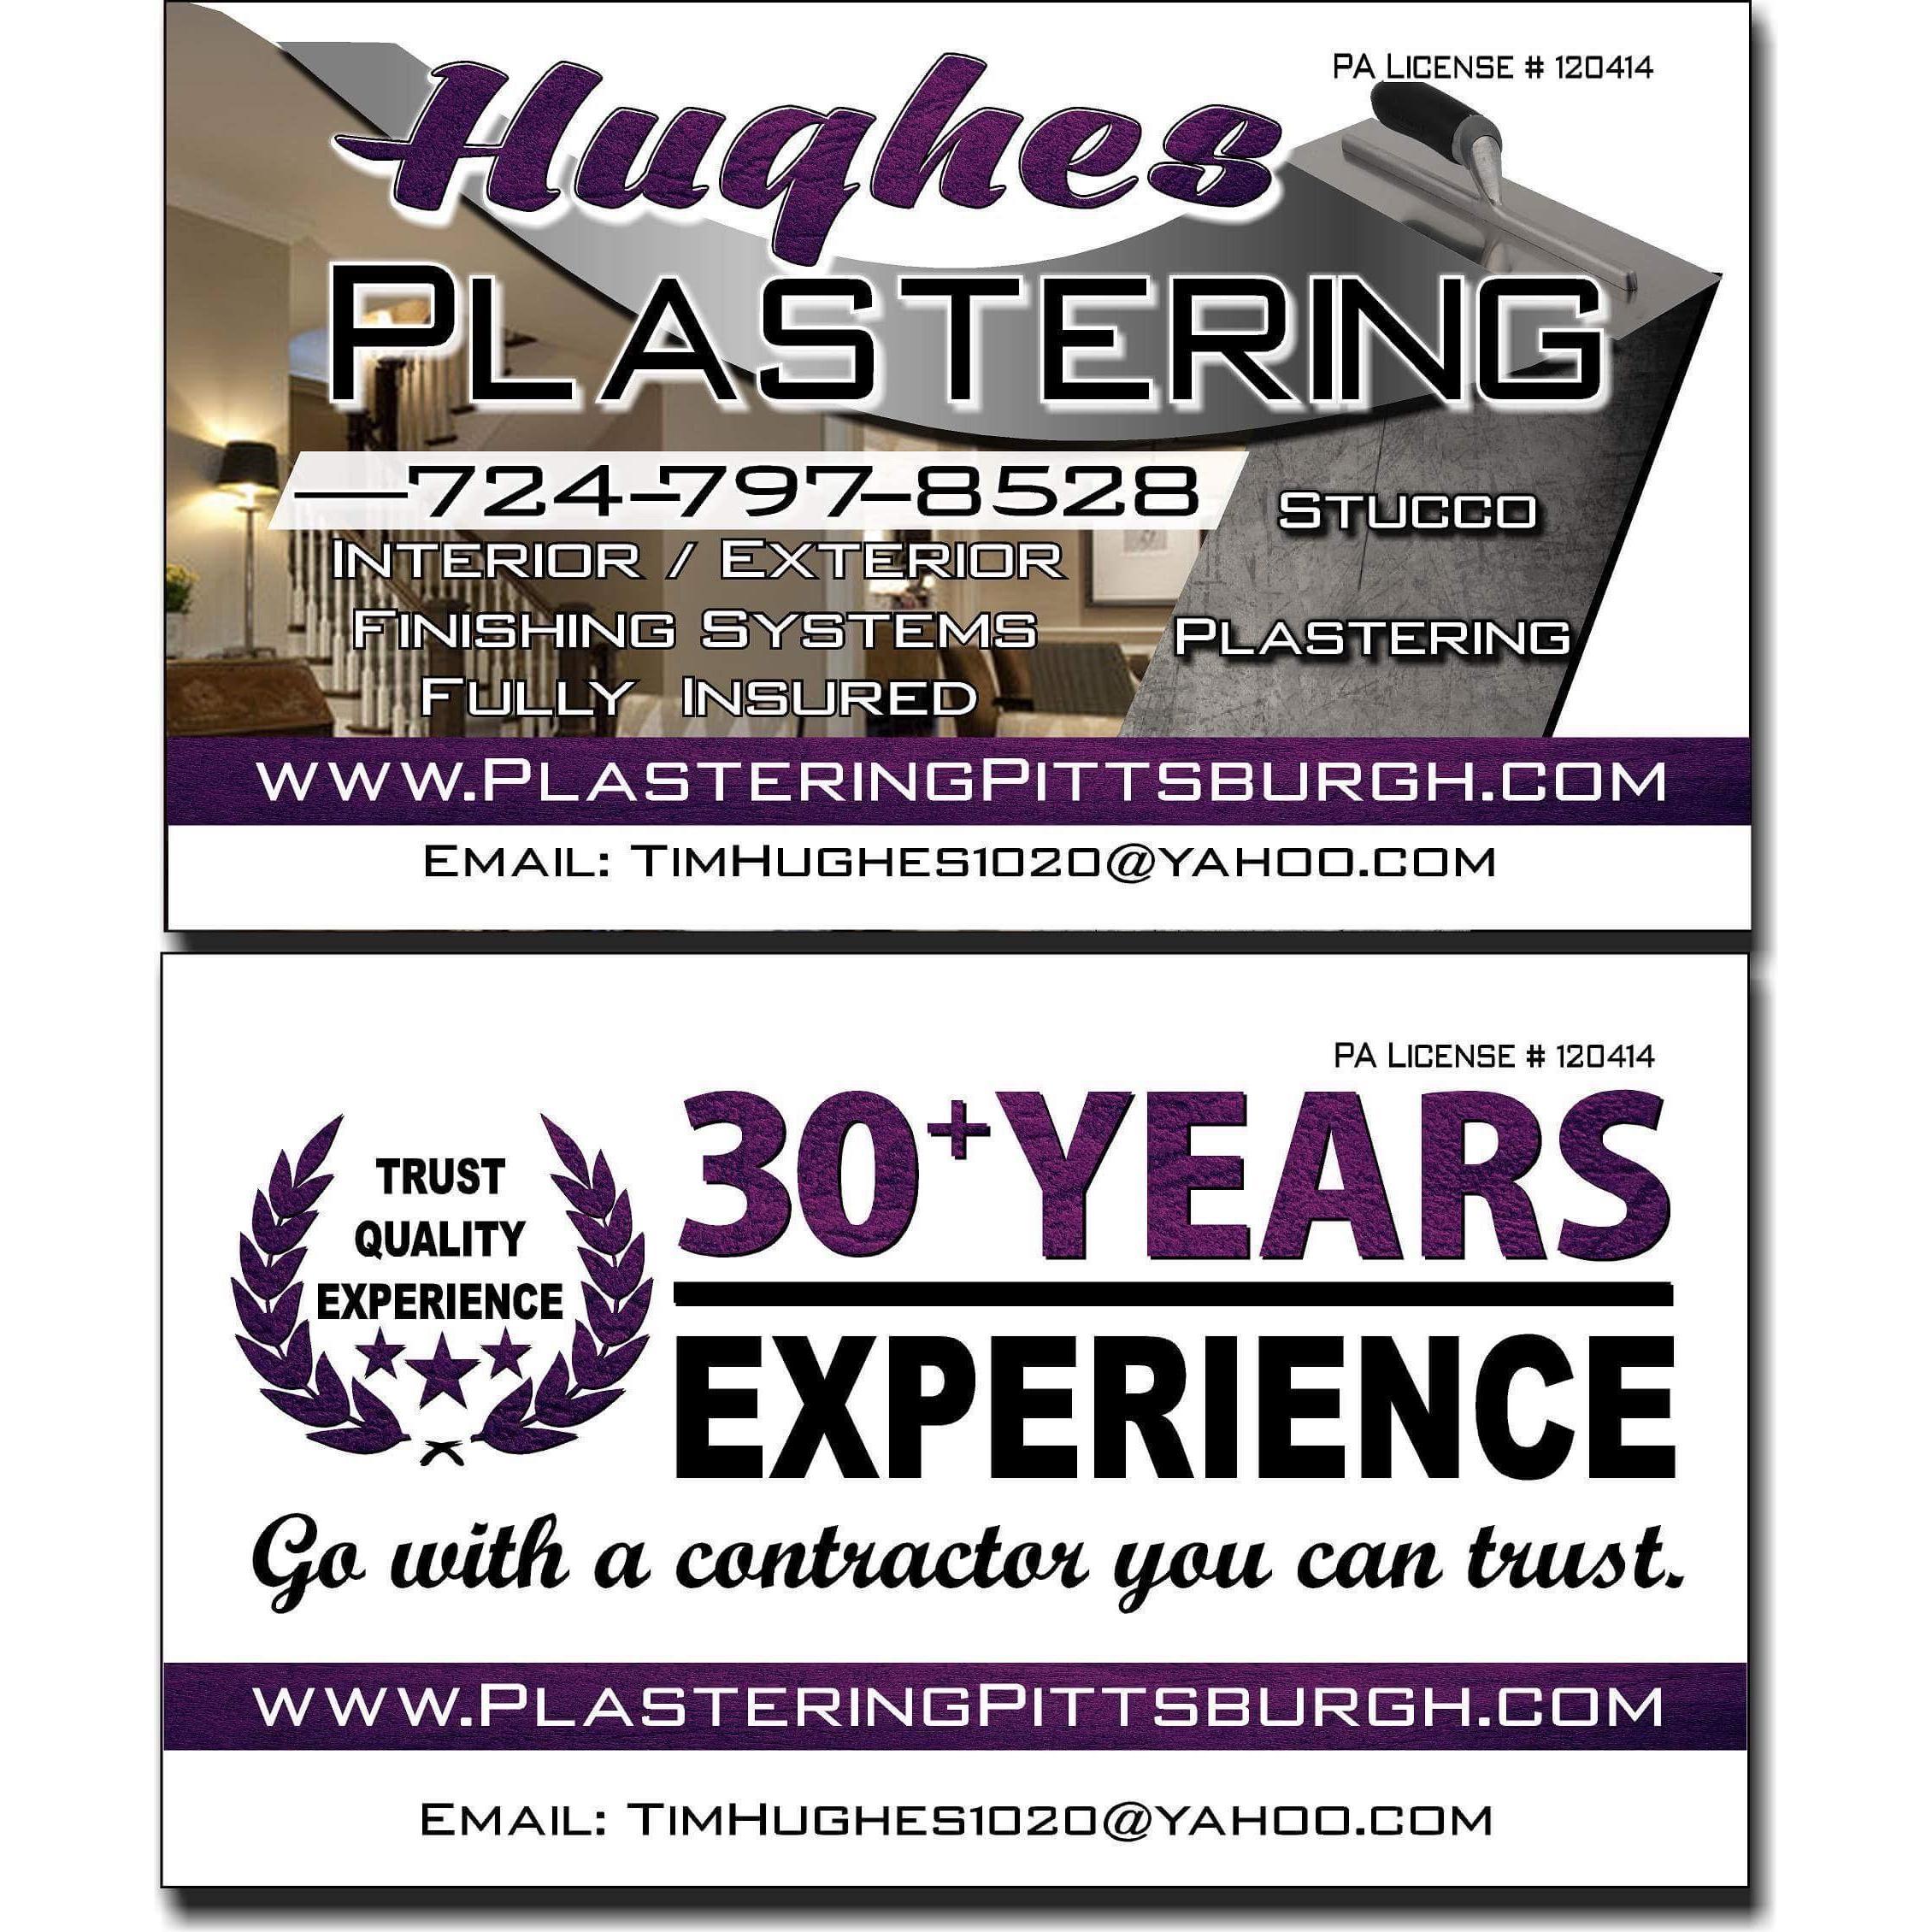 Hughes Plastering image 21